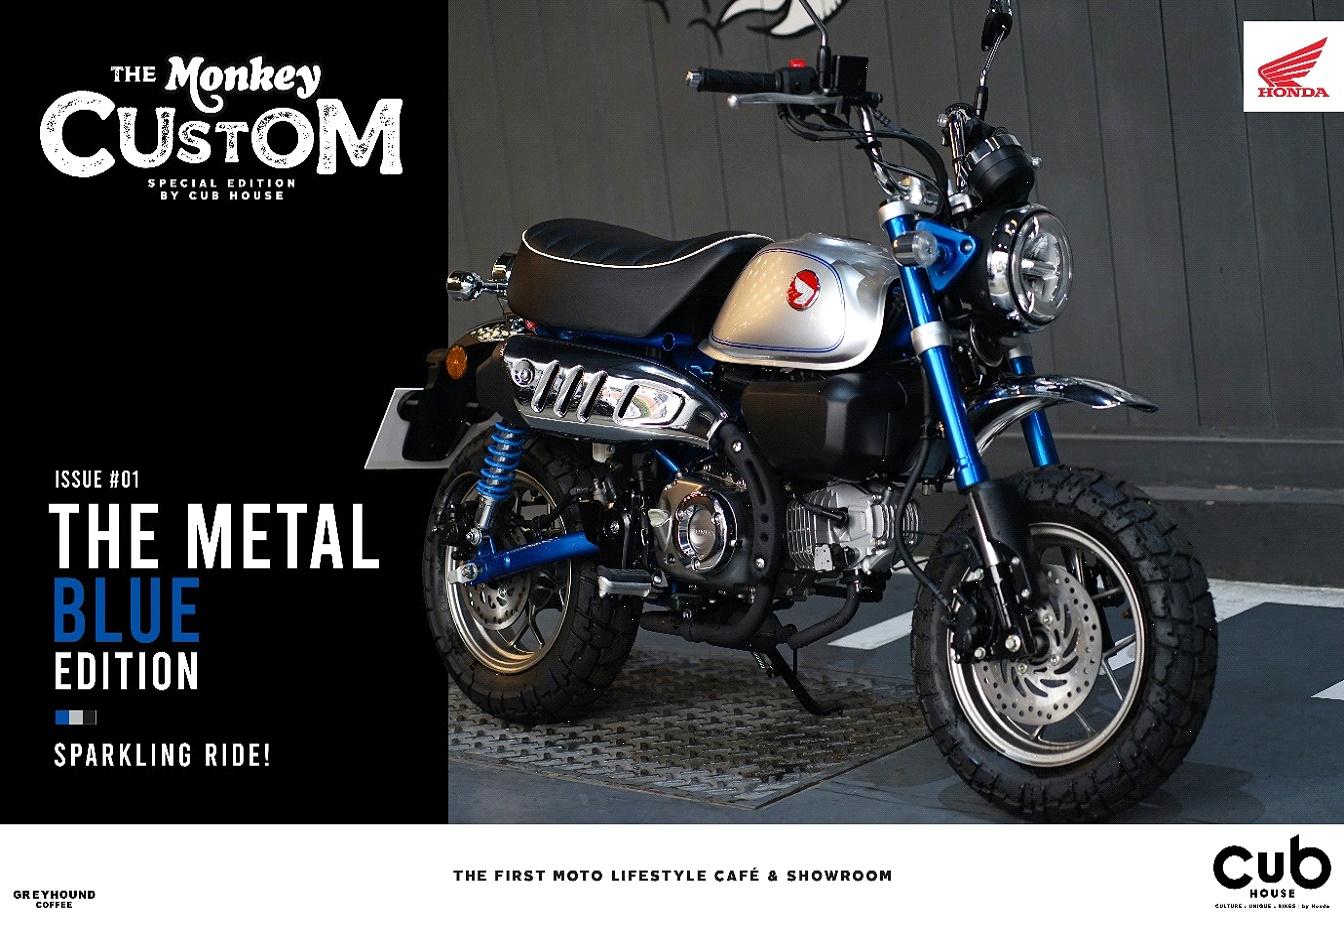 Honda Monkey 125 2020 รุ่นTHE METAL BLUE EDITION